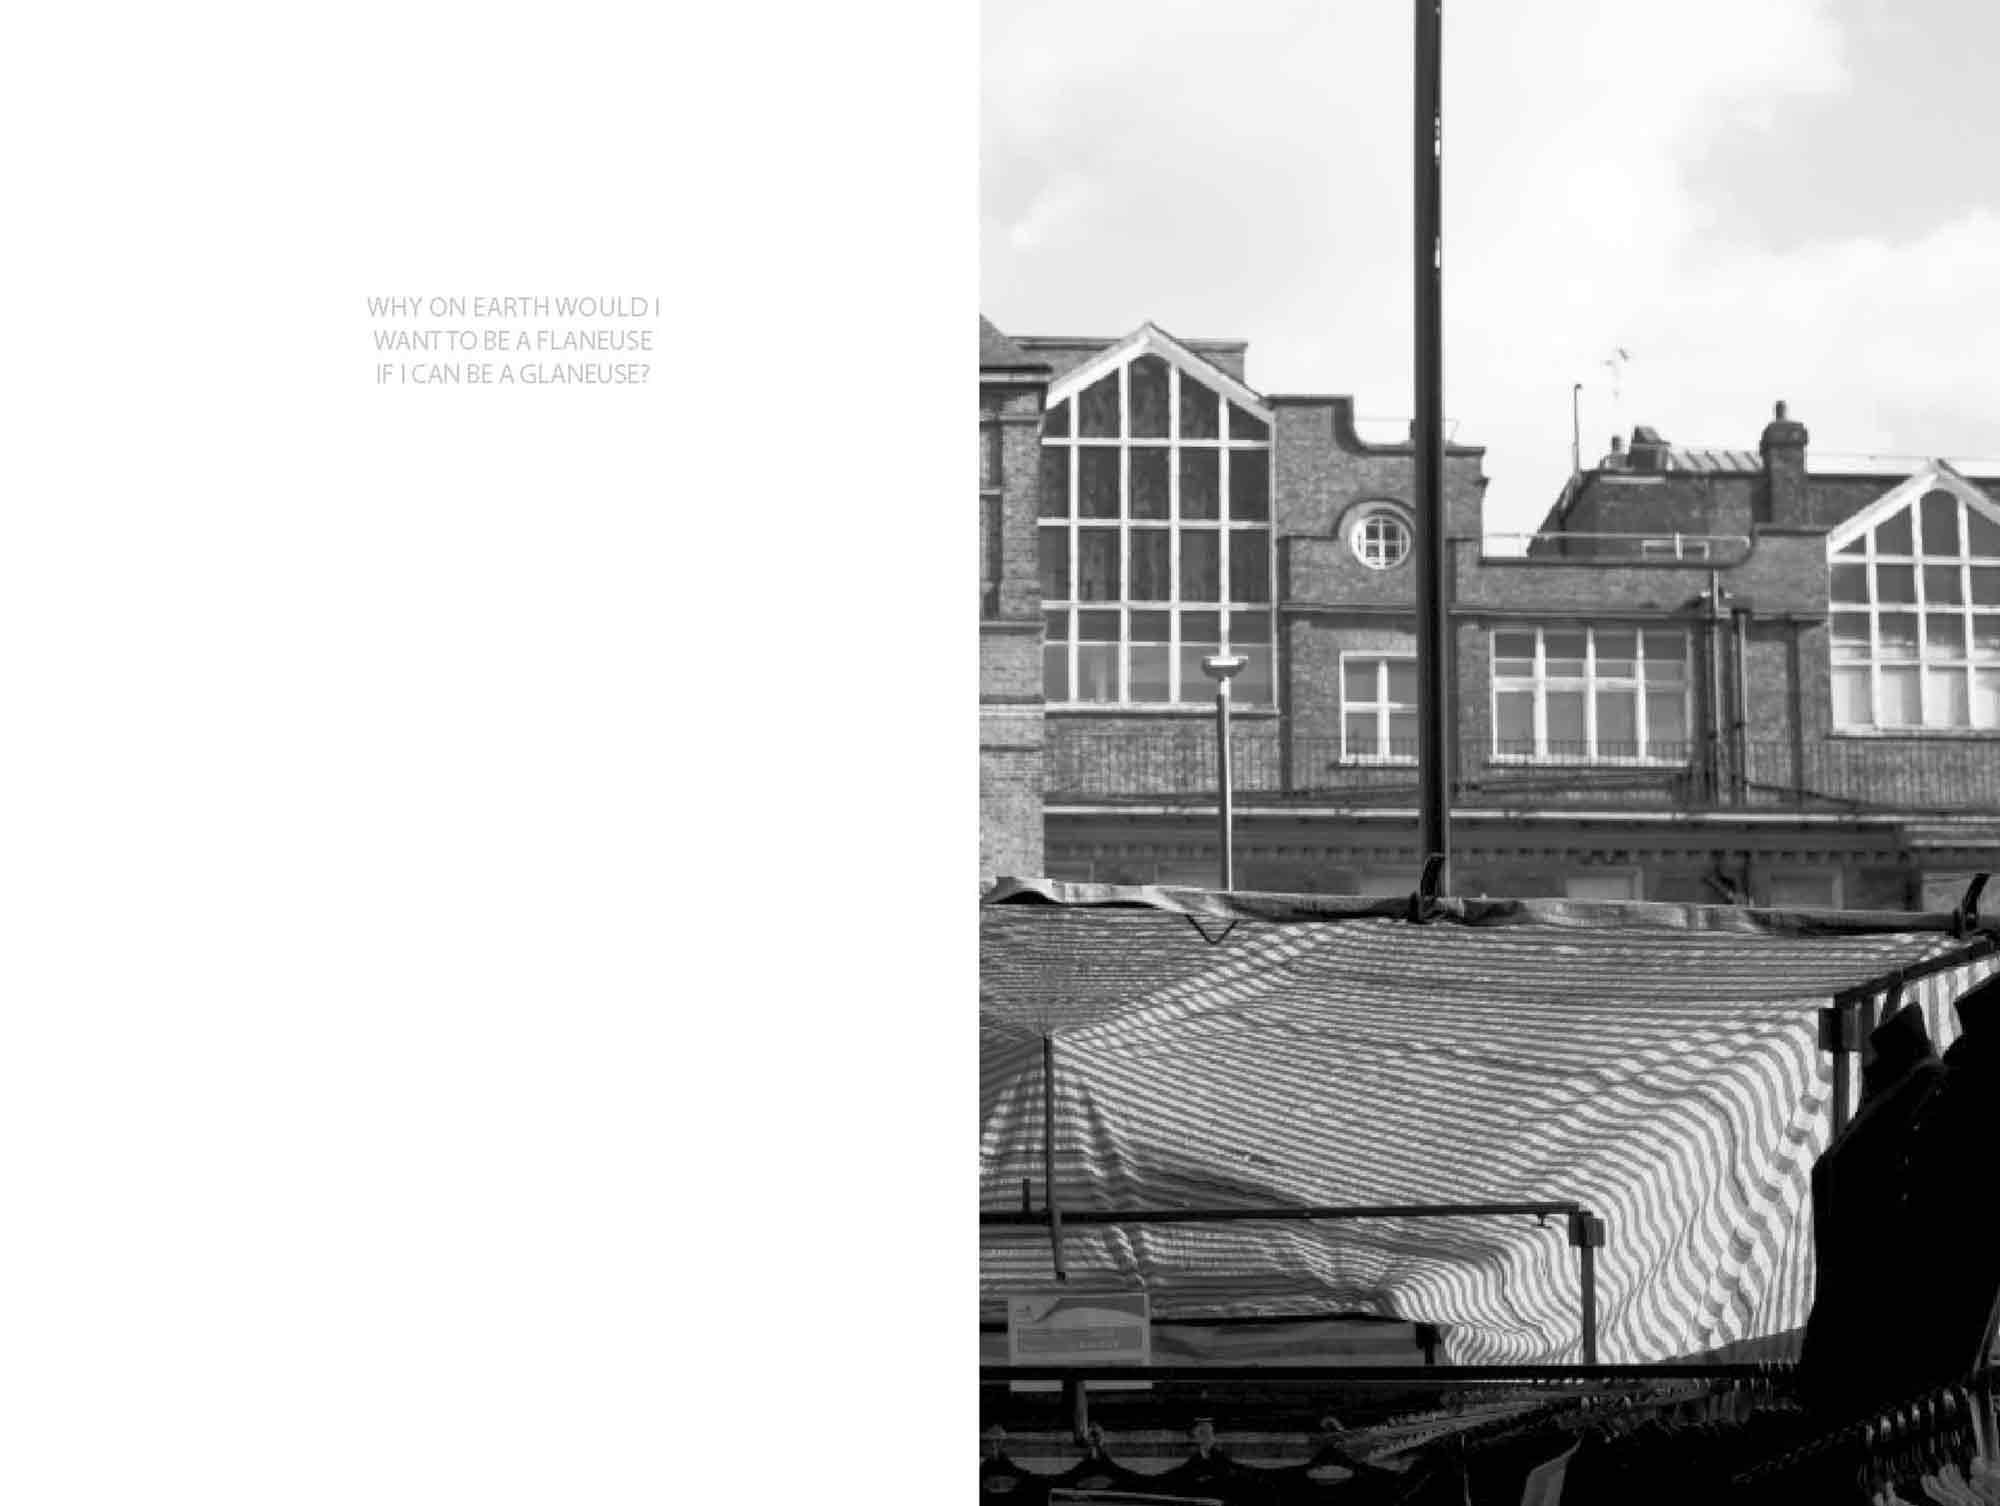 msdm-blackchapel-glaneuse-07